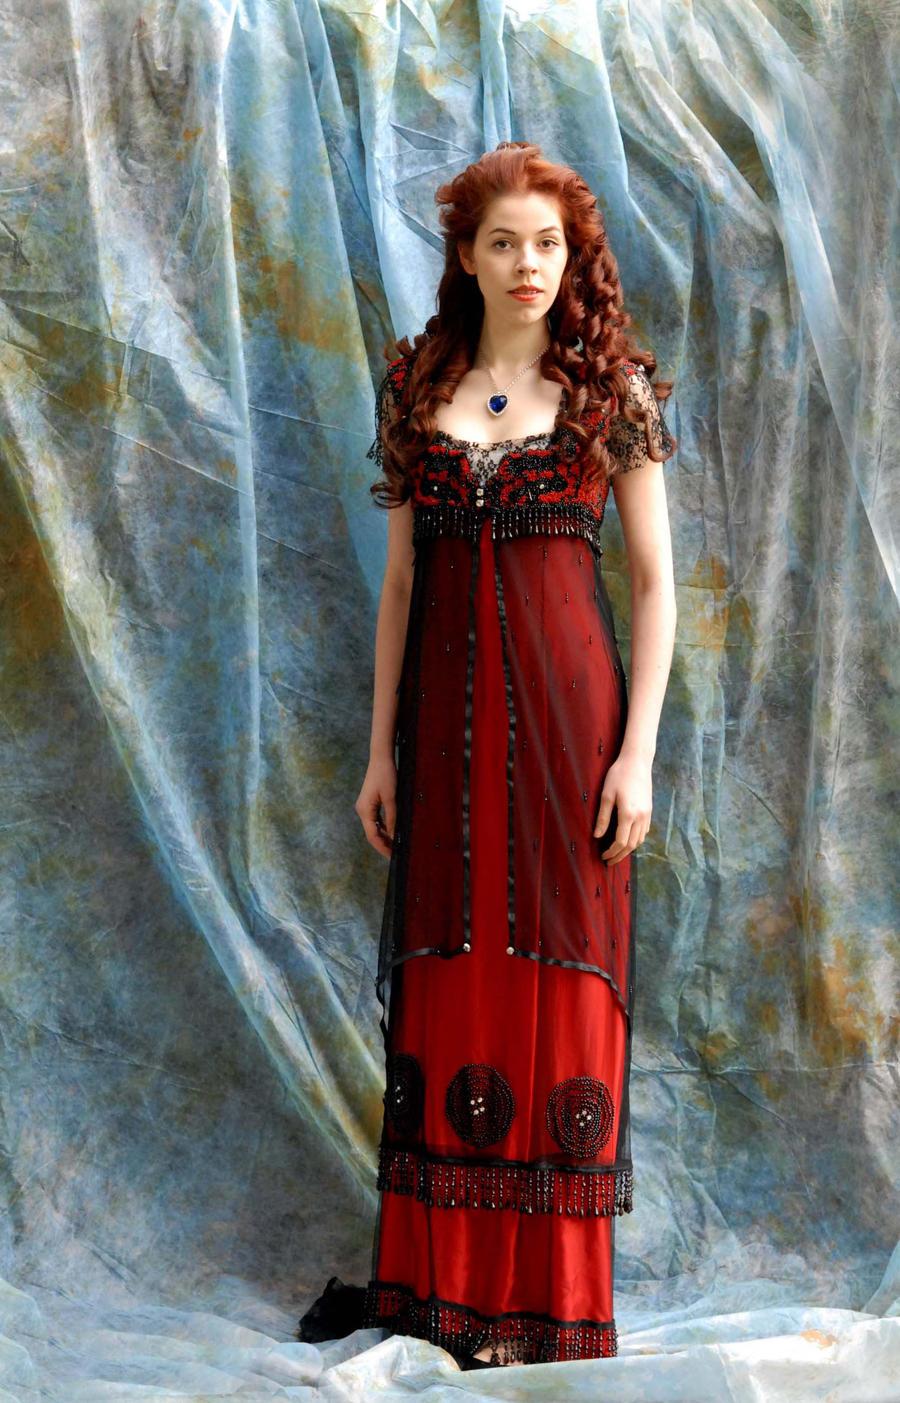 Kate Winslet Titanic Red Dress | www.pixshark.com - Images ...